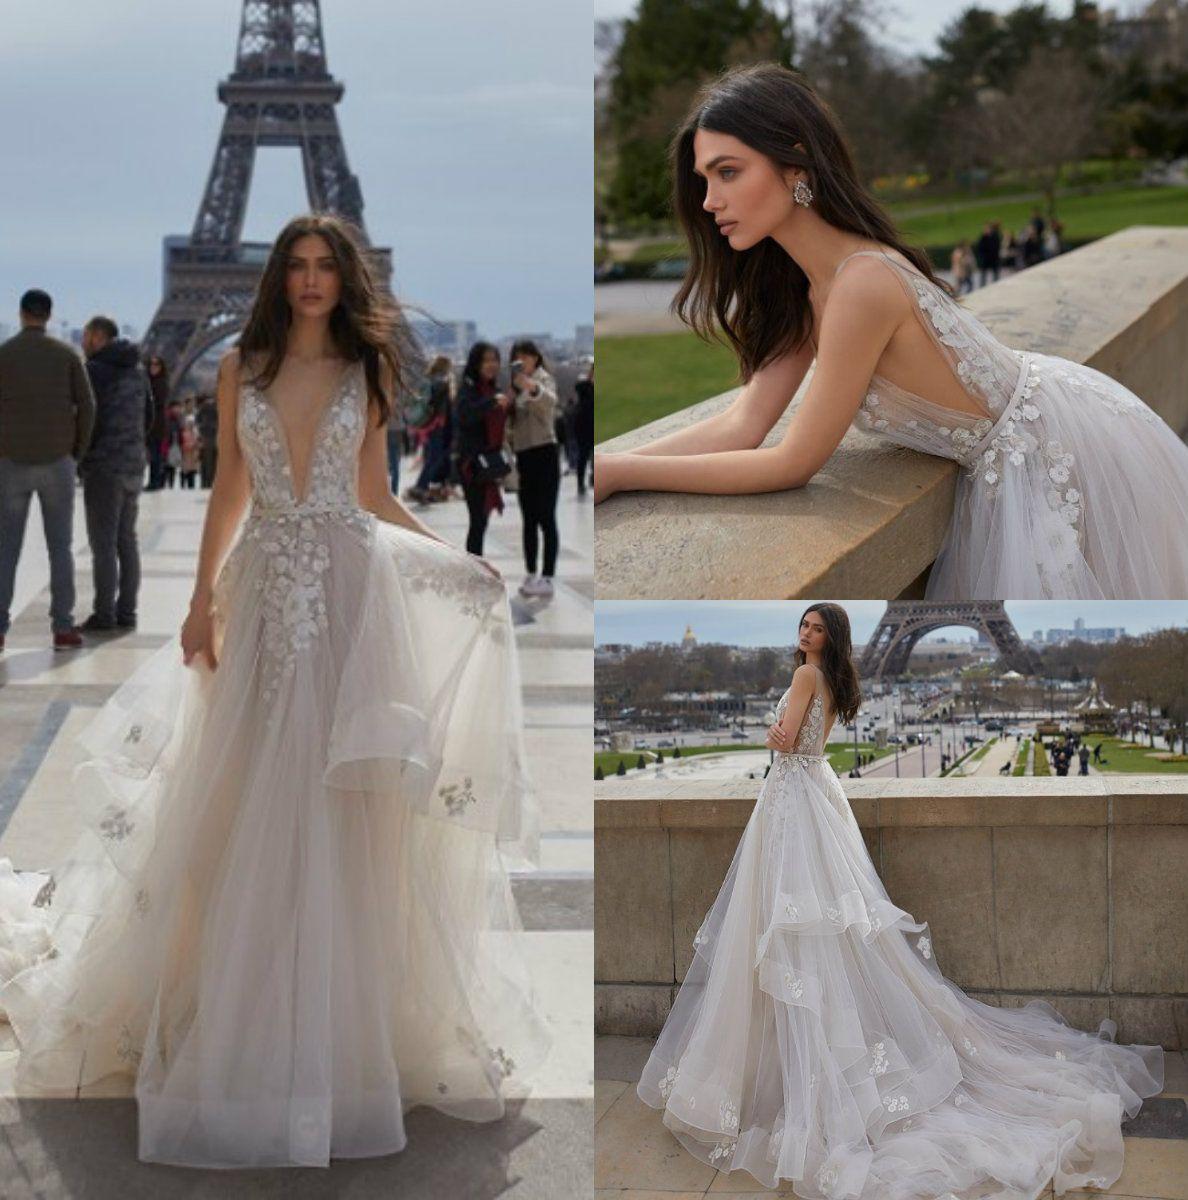 Discount Julie Vino 2019 Backless Wedding Dress V Neck Appliqued Bridal  Gowns Custom Vestido De Novia Sweep Train Castle Wedding Gowns Cheap Online  Shopping ... d79902c05c4a